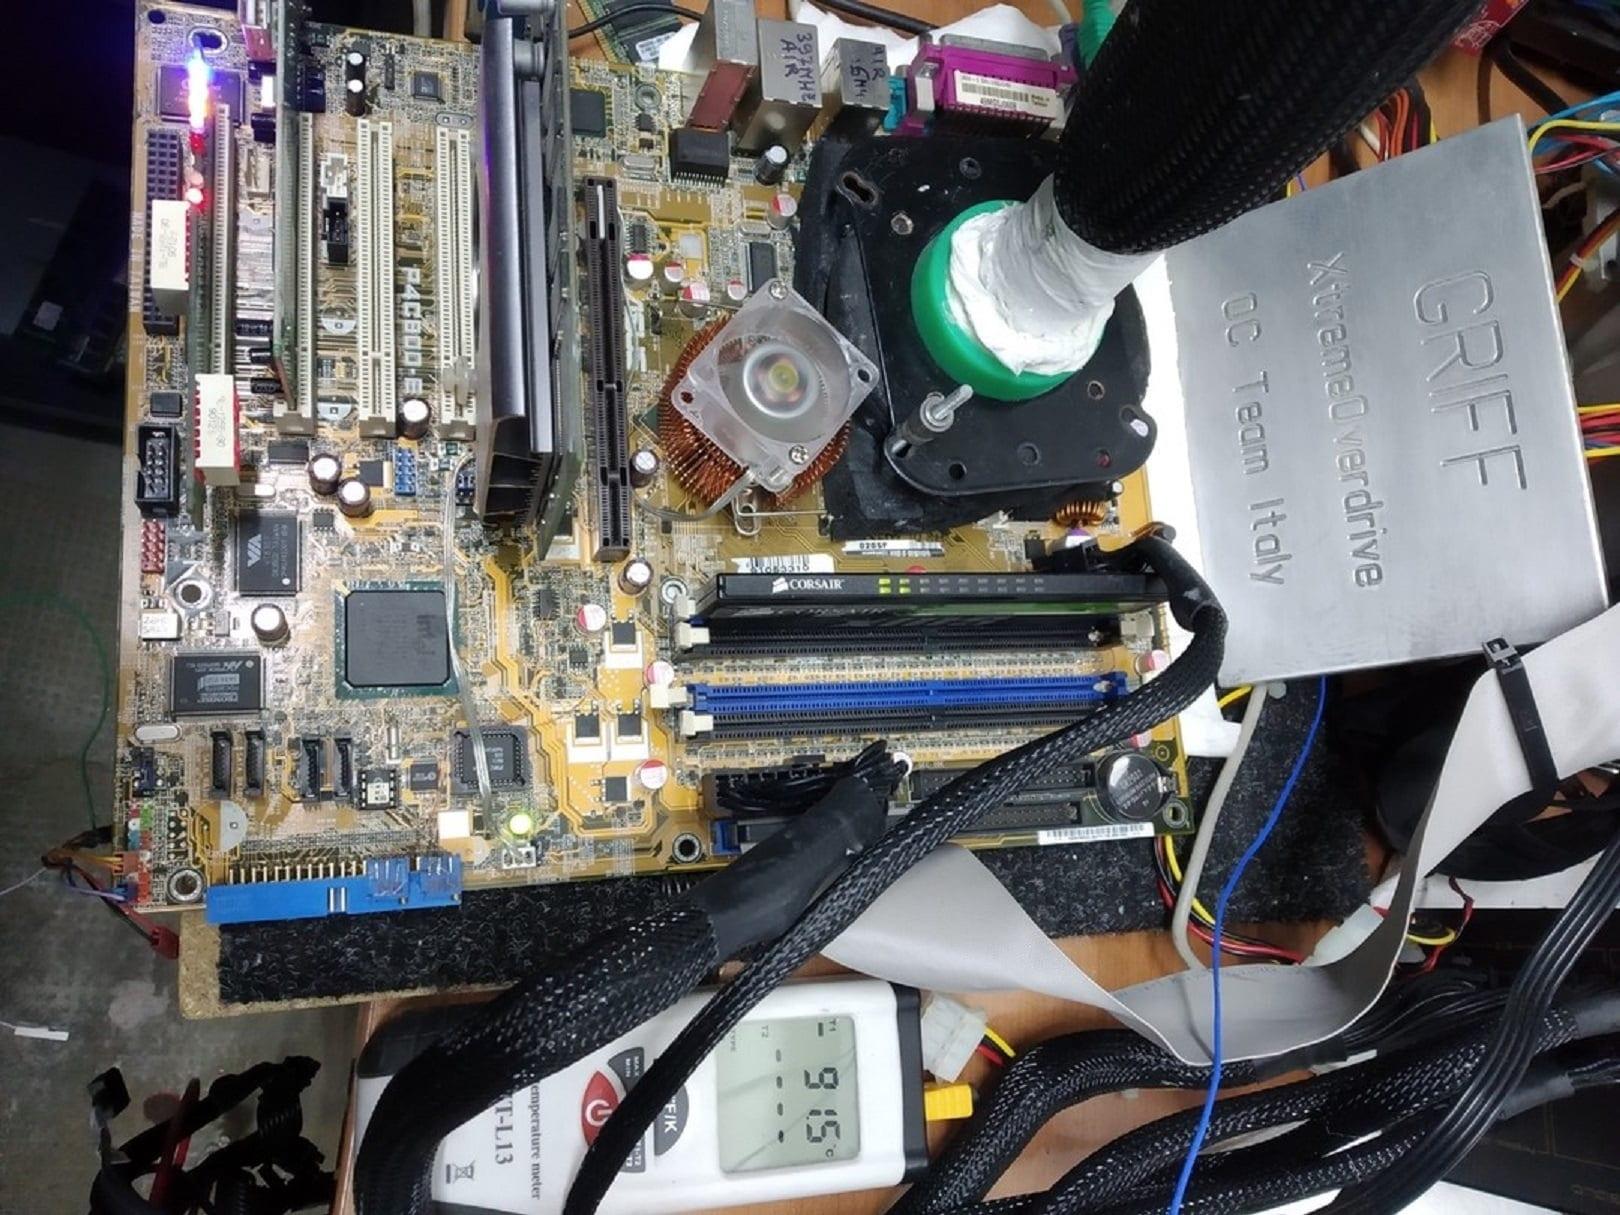 ADVenturePO установил рекорд в 24-ядерном зачете с помощью разогнанного до 4450МГц чипа Threadripper 3960X